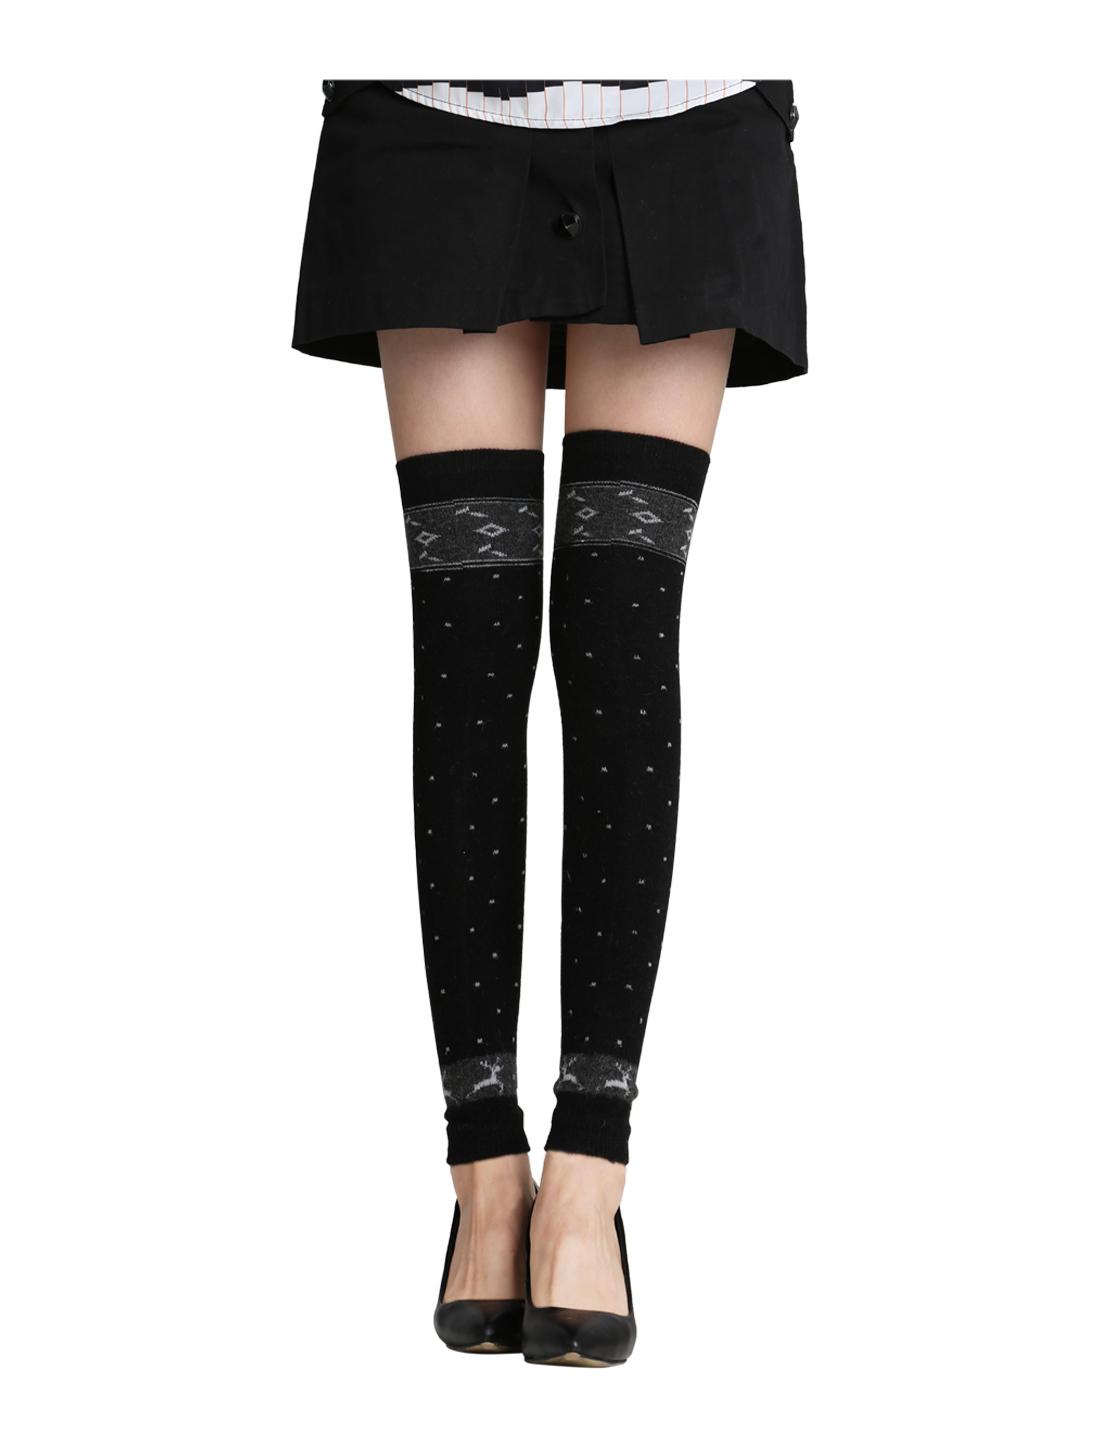 Women 1 Pack Stripes Dots Novelty Pattern Knee High Leg Warmers Black